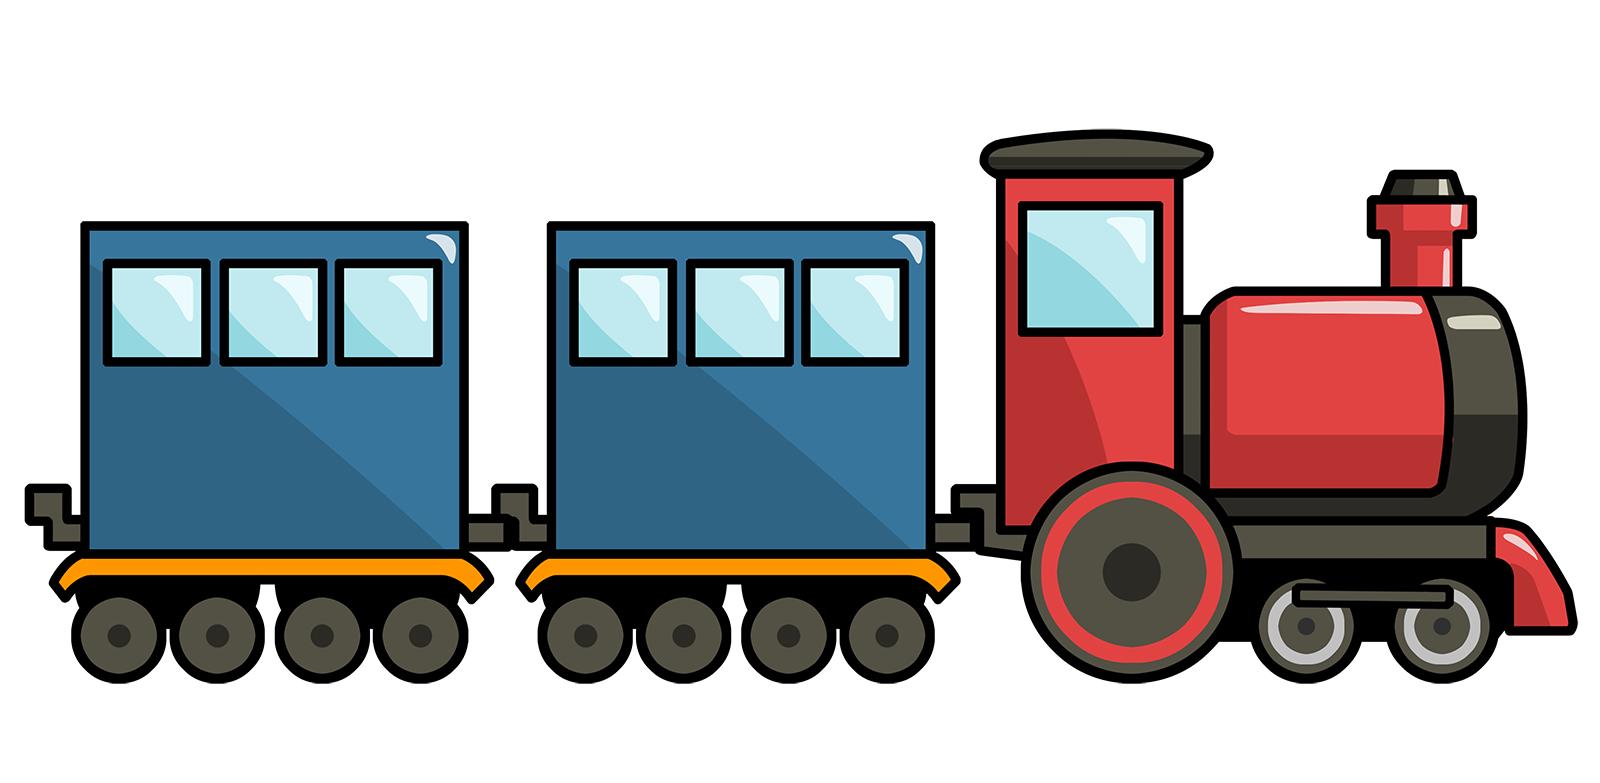 86+ Train Clipart.